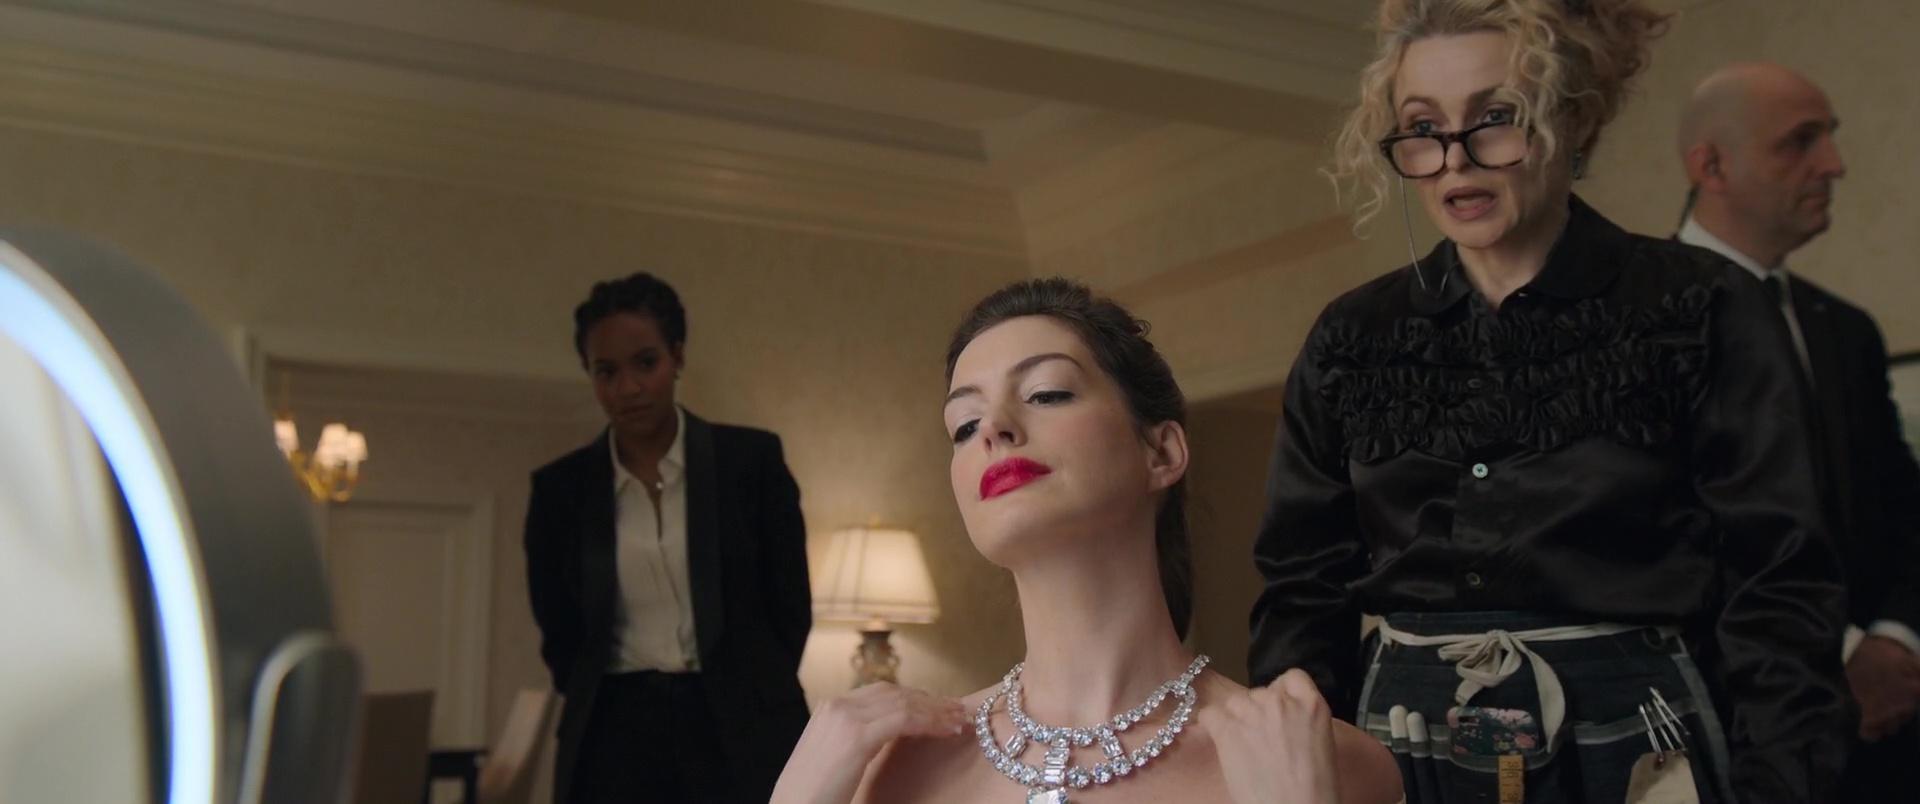 Cartier Necklace Toussaint Worn By Anne Hathaway Daphne